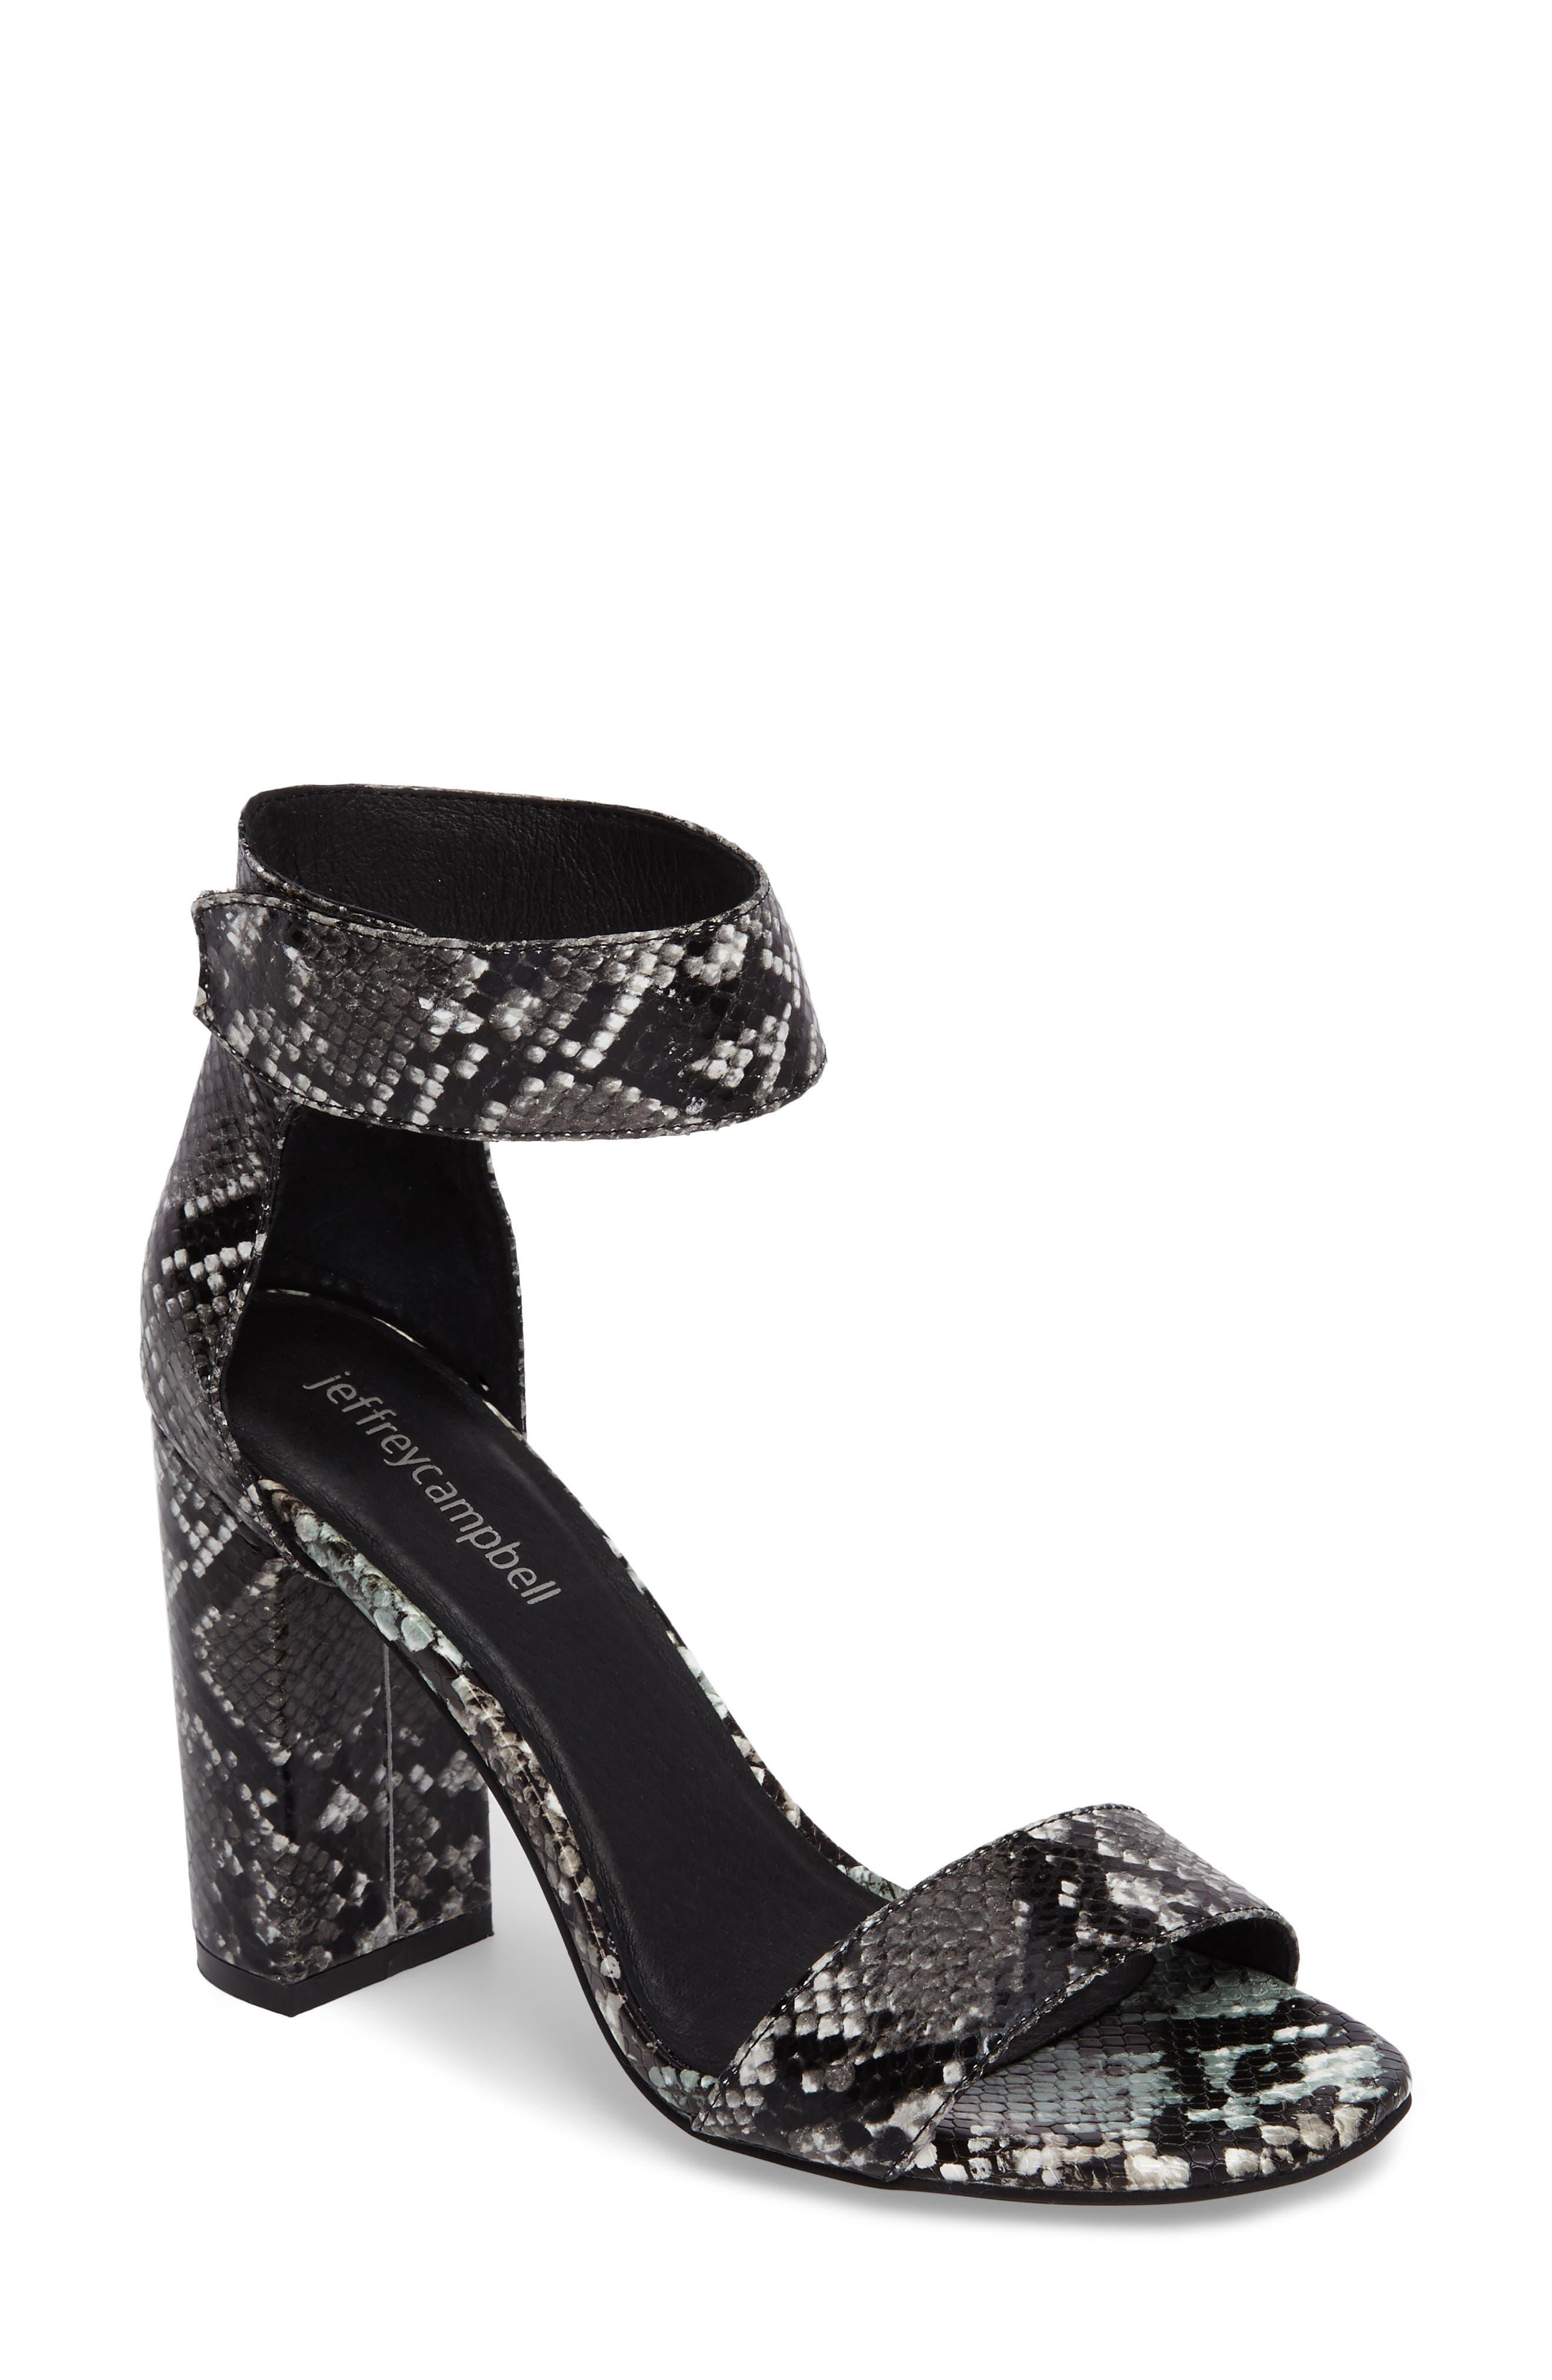 'Lindsay' Ankle Strap Sandal,                             Main thumbnail 1, color,                             Black Grey Snake